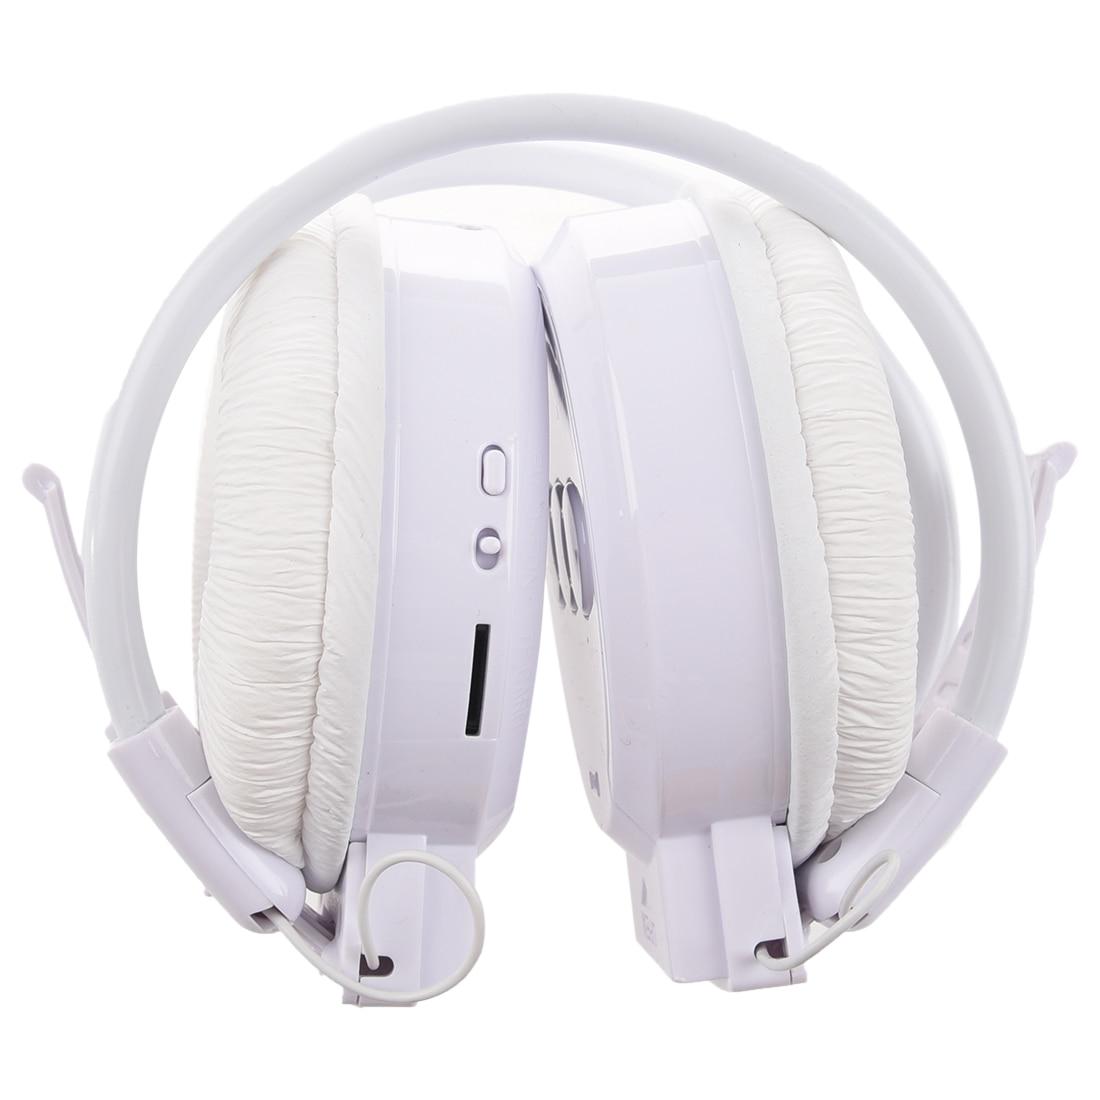 MP3 player FM radio White Sport Headphones + Audio USB cable